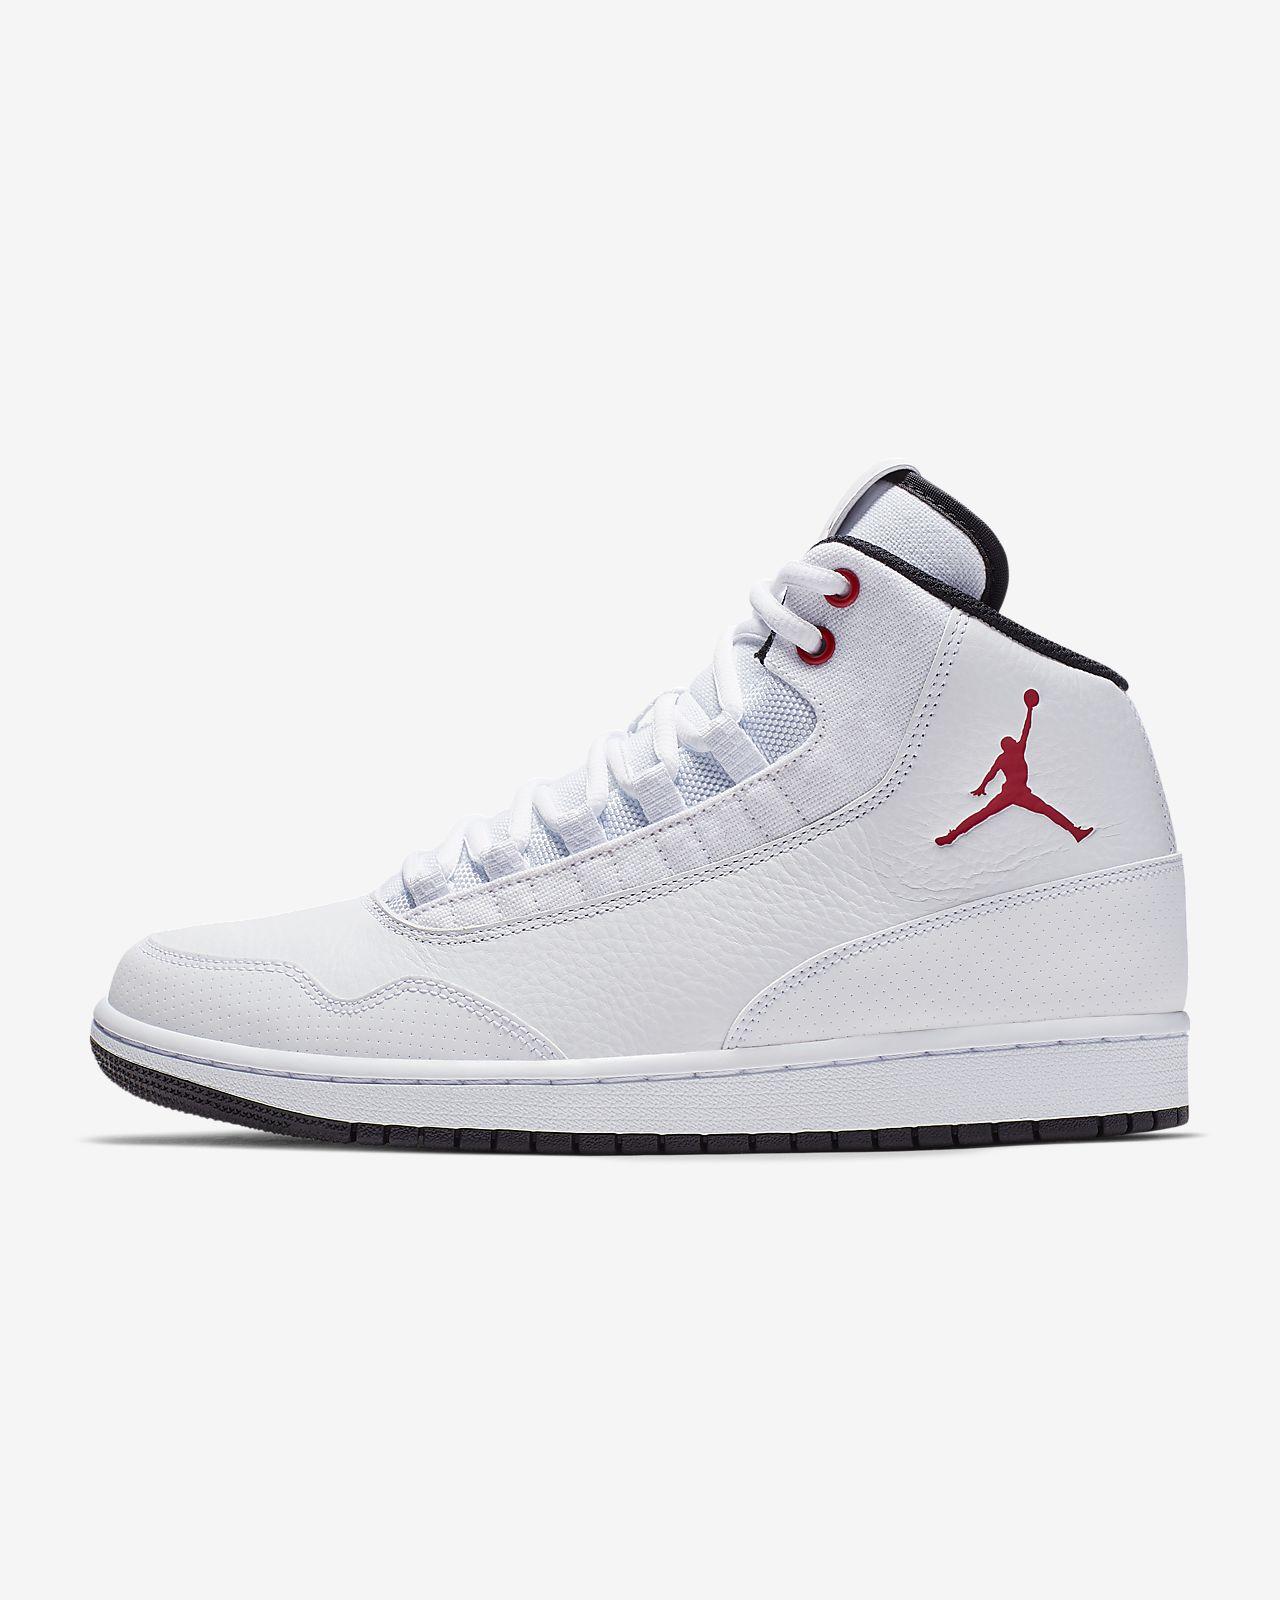 the latest 44f1f 82452 Scarpa Jordan Executive - Uomo. Nike.com IT